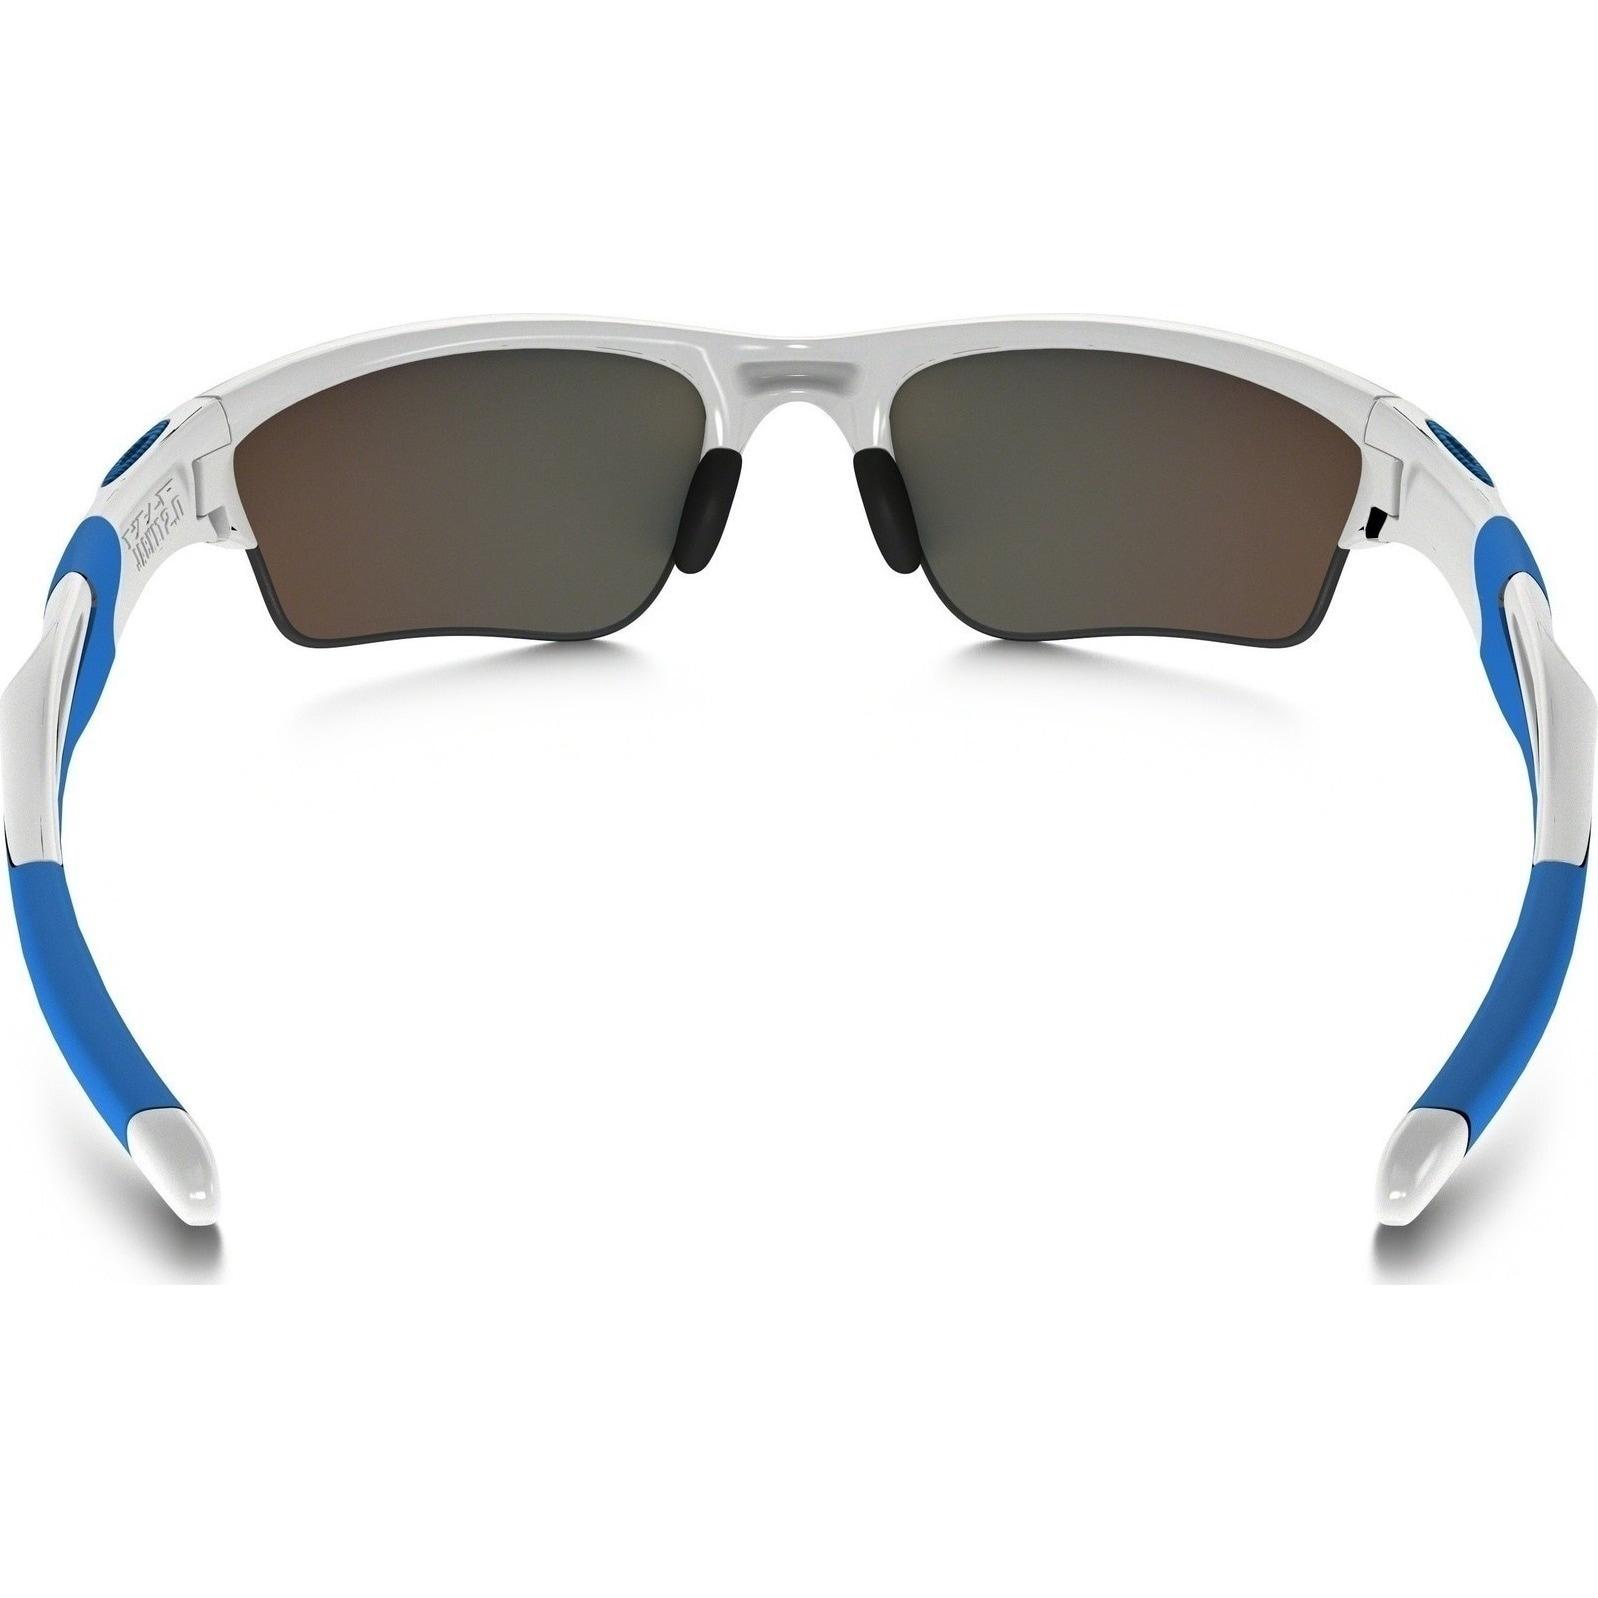 eaced6bab1 Shop Oakley Men s OO9154-54 Half Jacket White Frame Polarized Sapphire  Iridium 62mm Lens Sunglasses - Free Shipping Today - Overstock - 13788317